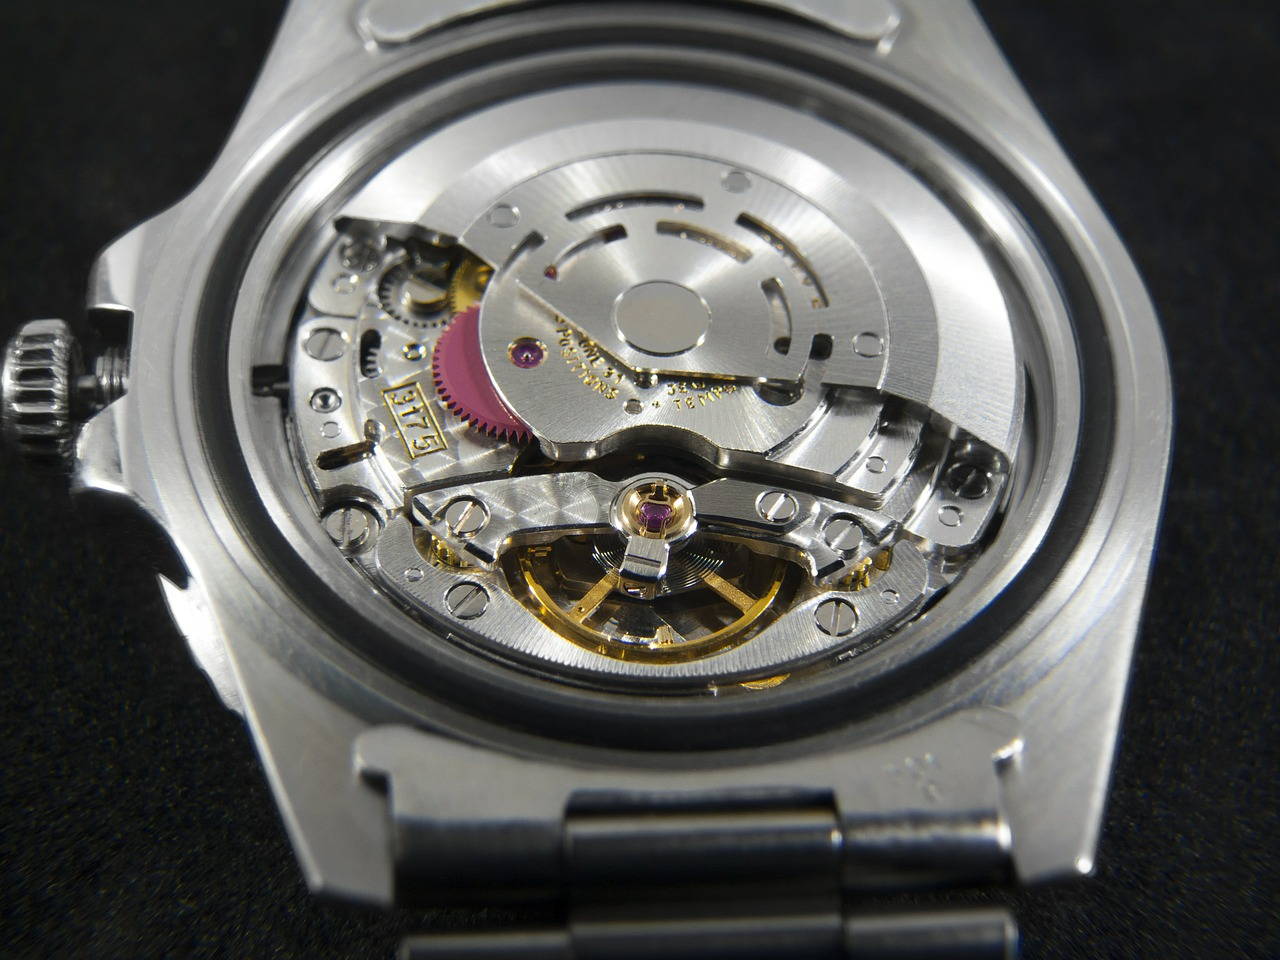 Rolex Watches, Watch Parts, Watch Movements, Hand-assembled, Silver Watch